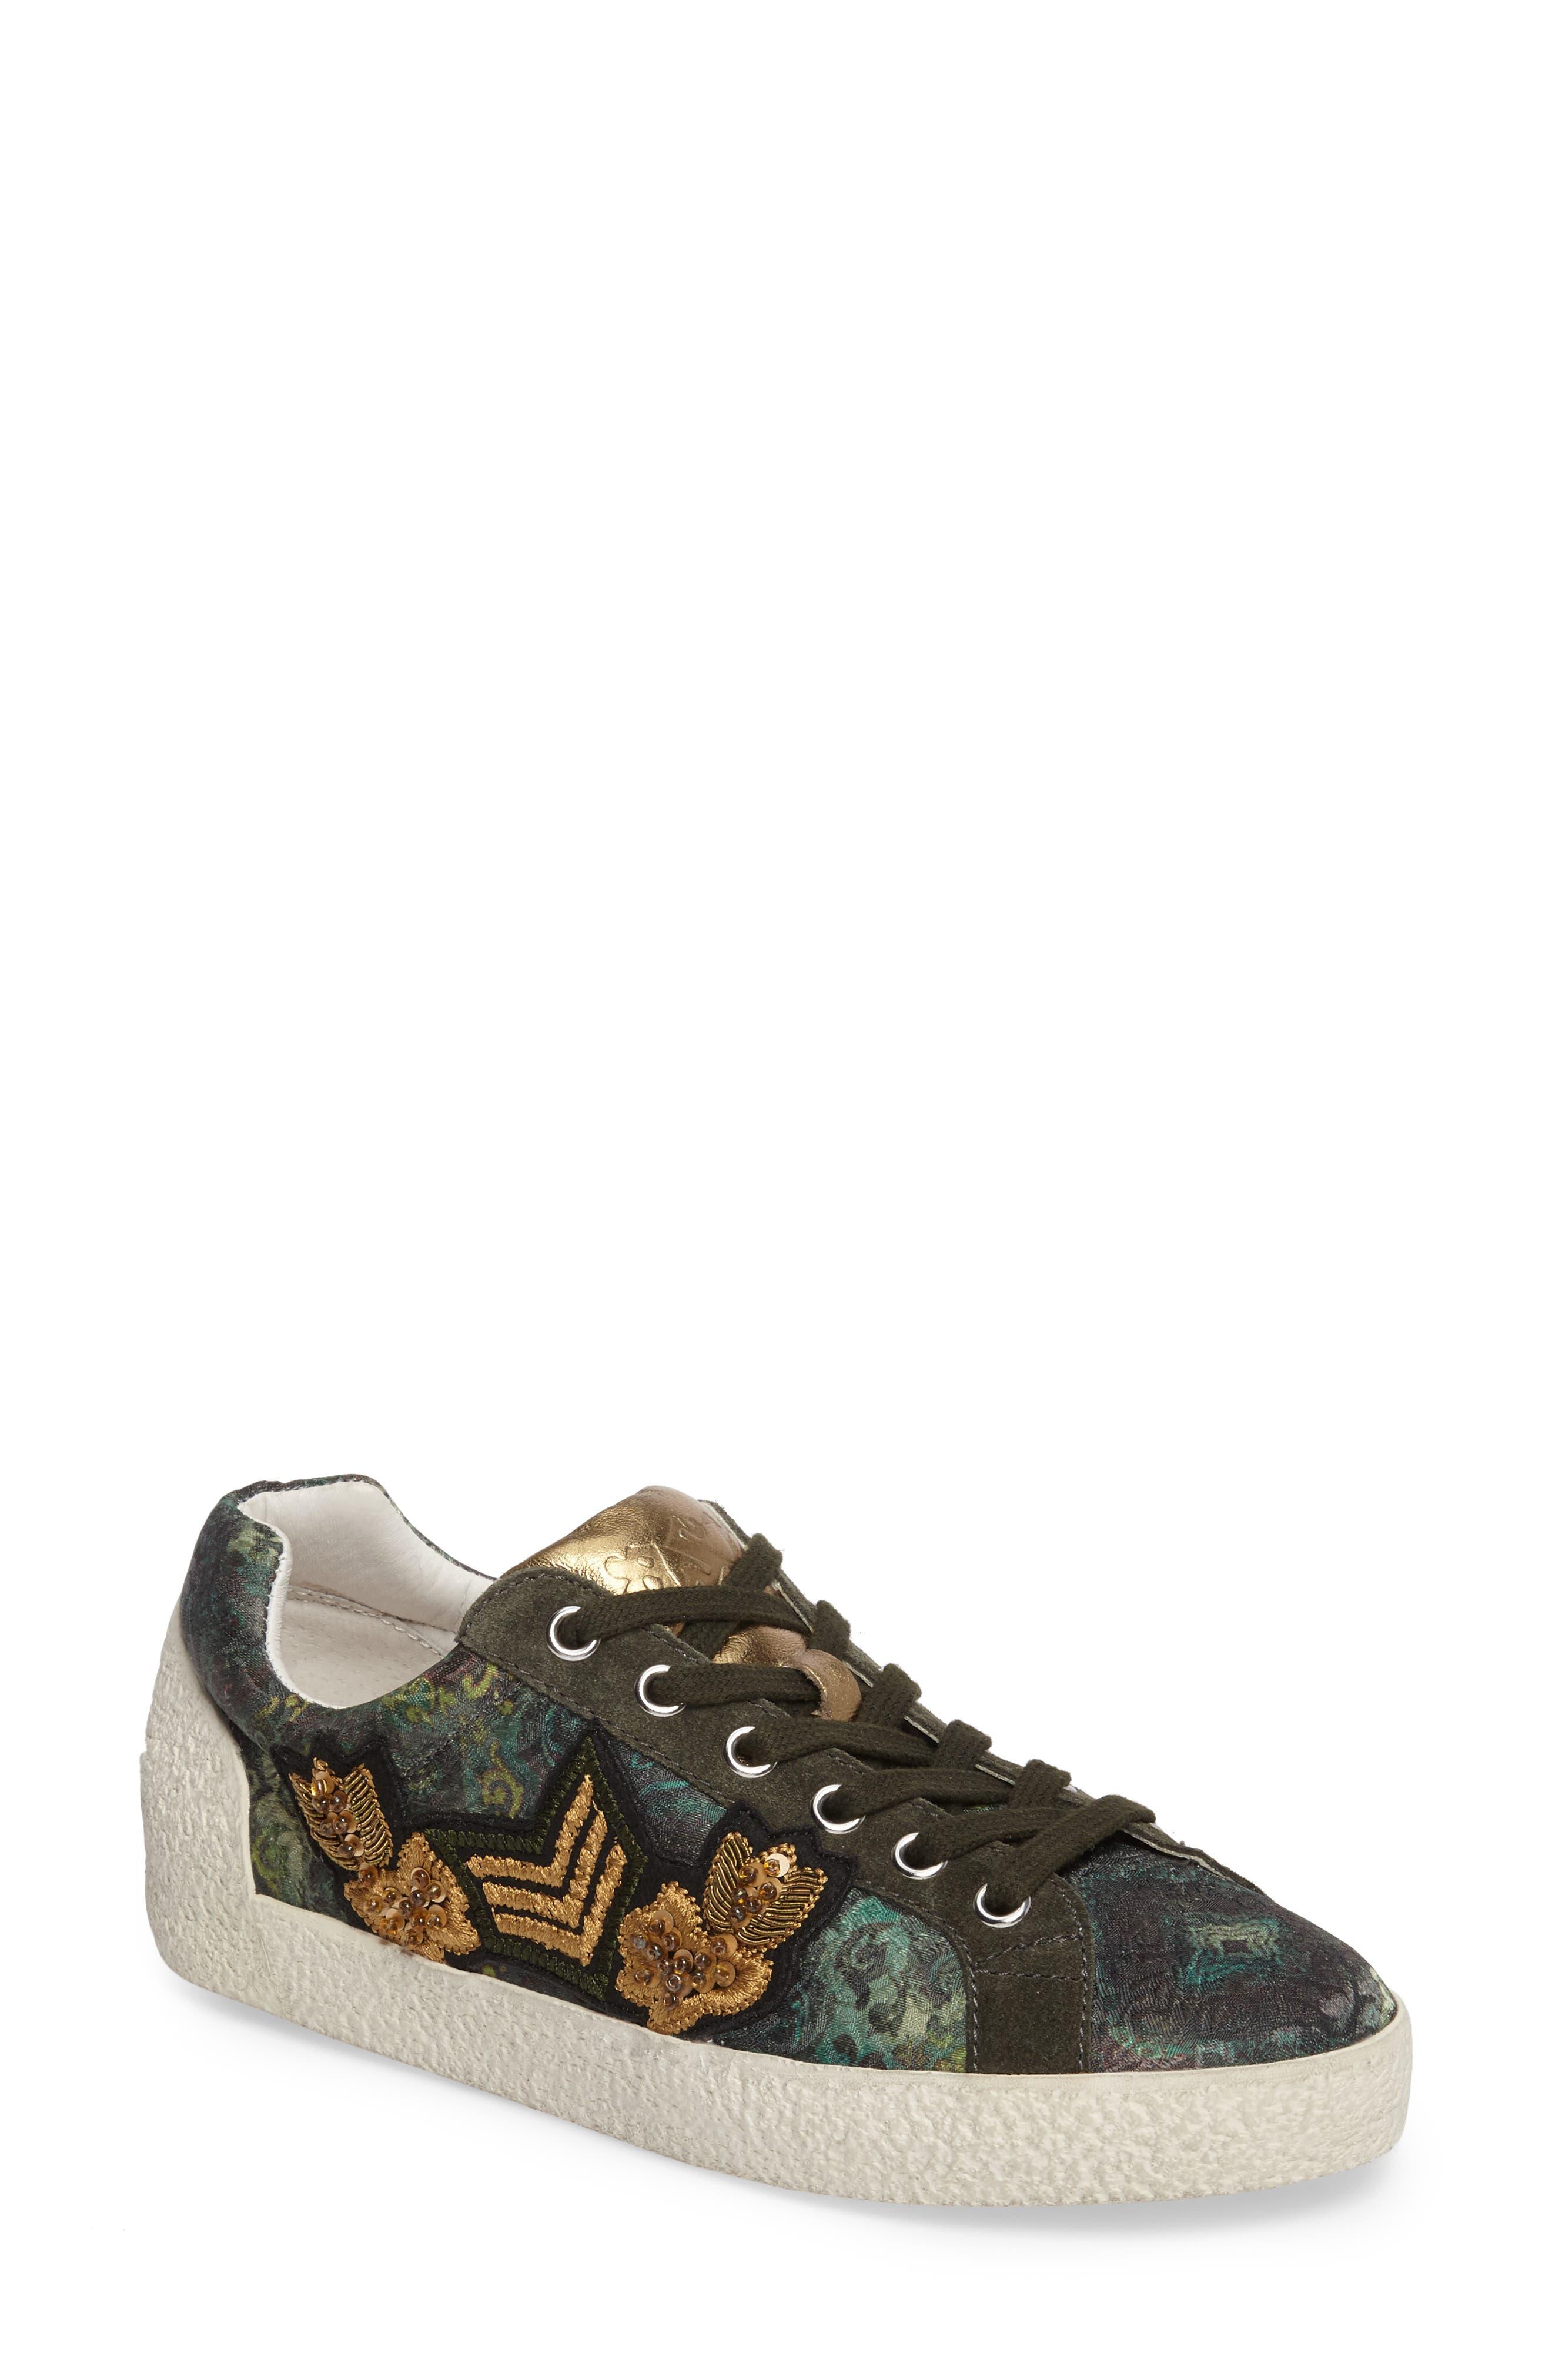 Alternate Image 1 Selected - Ash Embellished Low-Top Sneaker (Women)